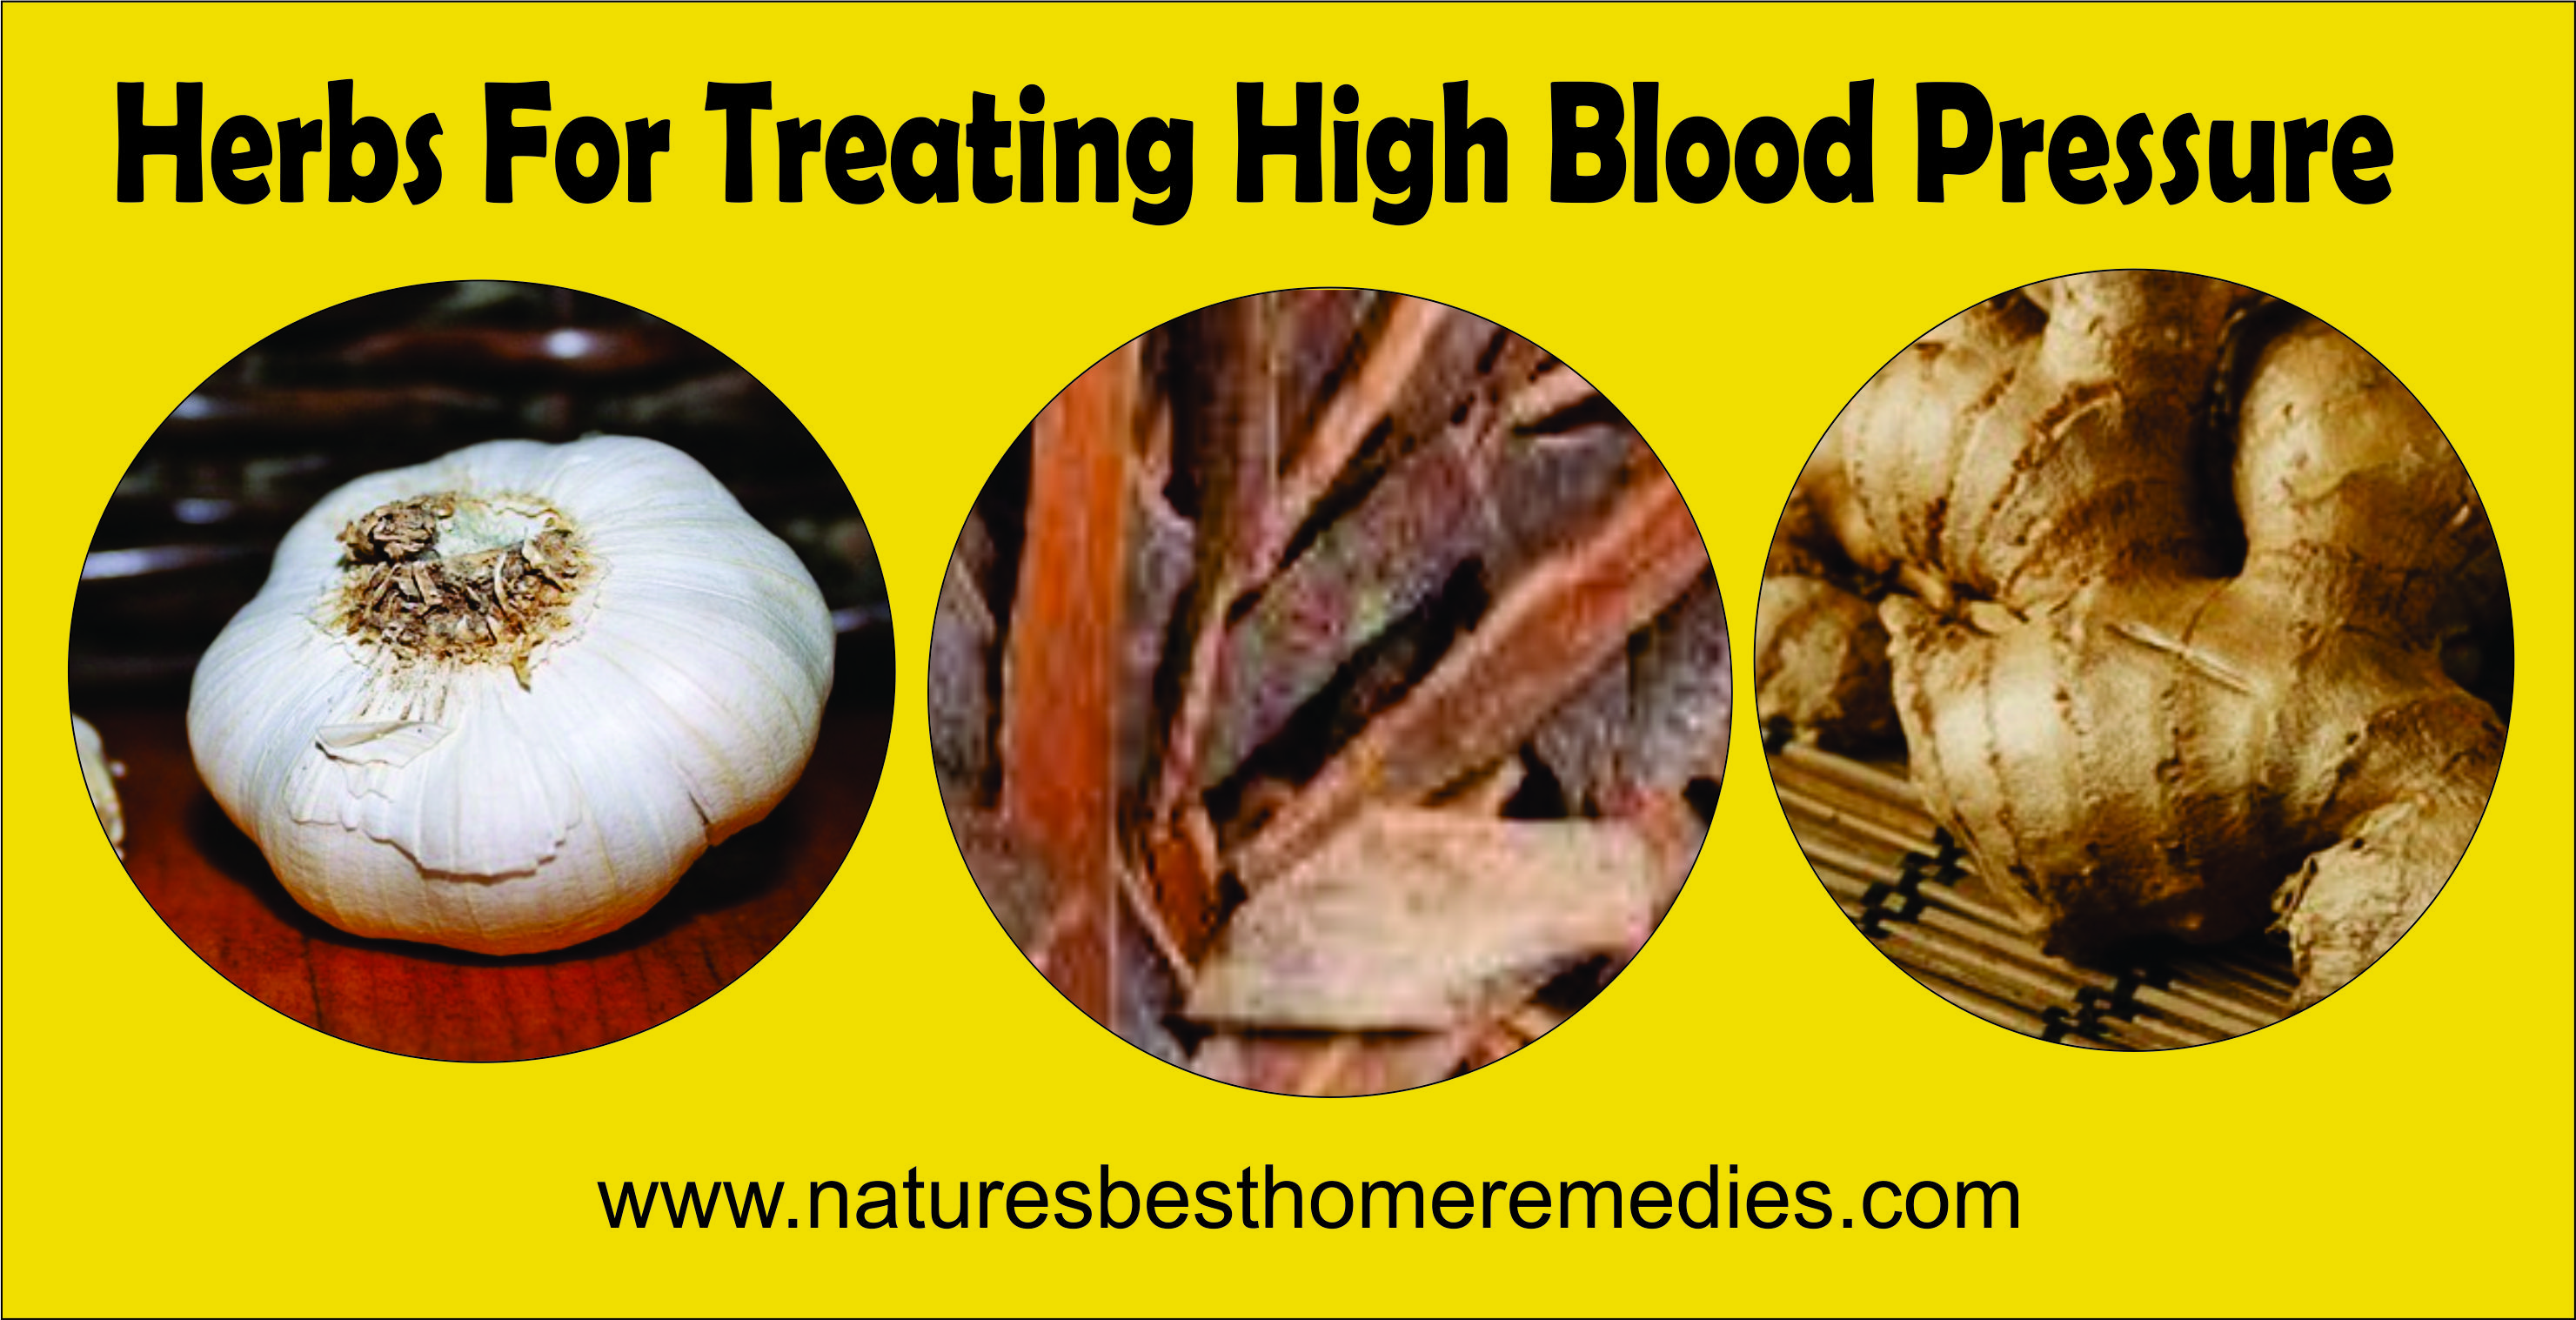 herbal-remedies-for-high-blood-pressure